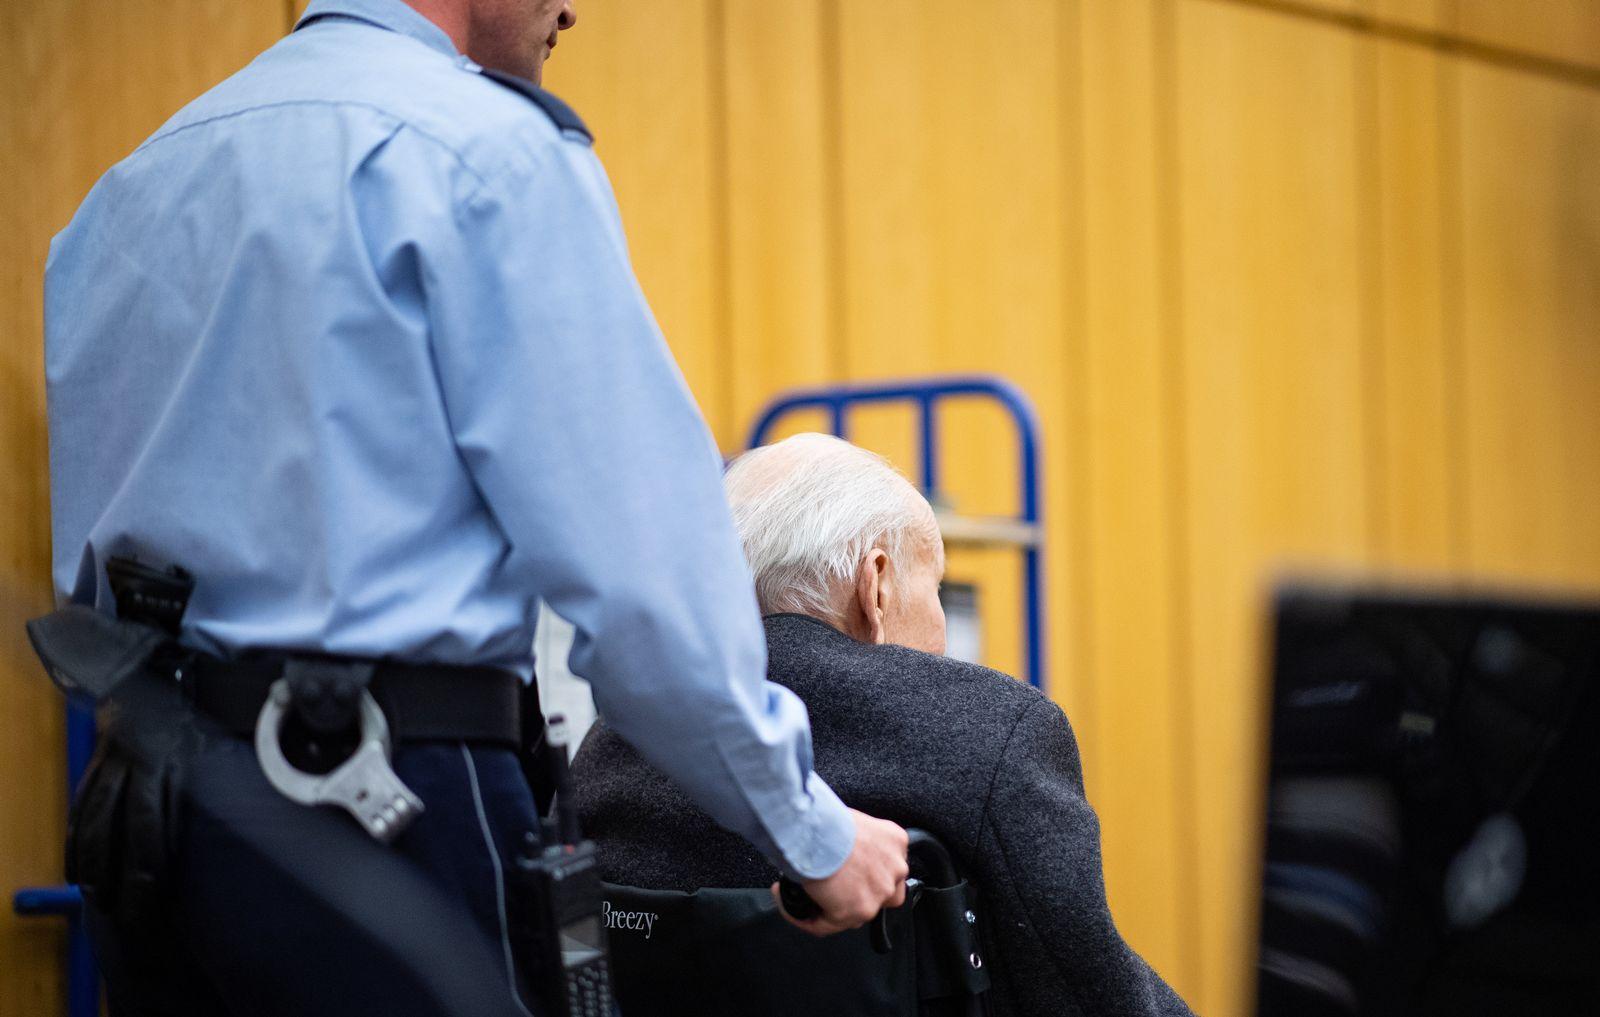 Prozess gegen ehemaligen SS-Wachmann / KZ Stutthof